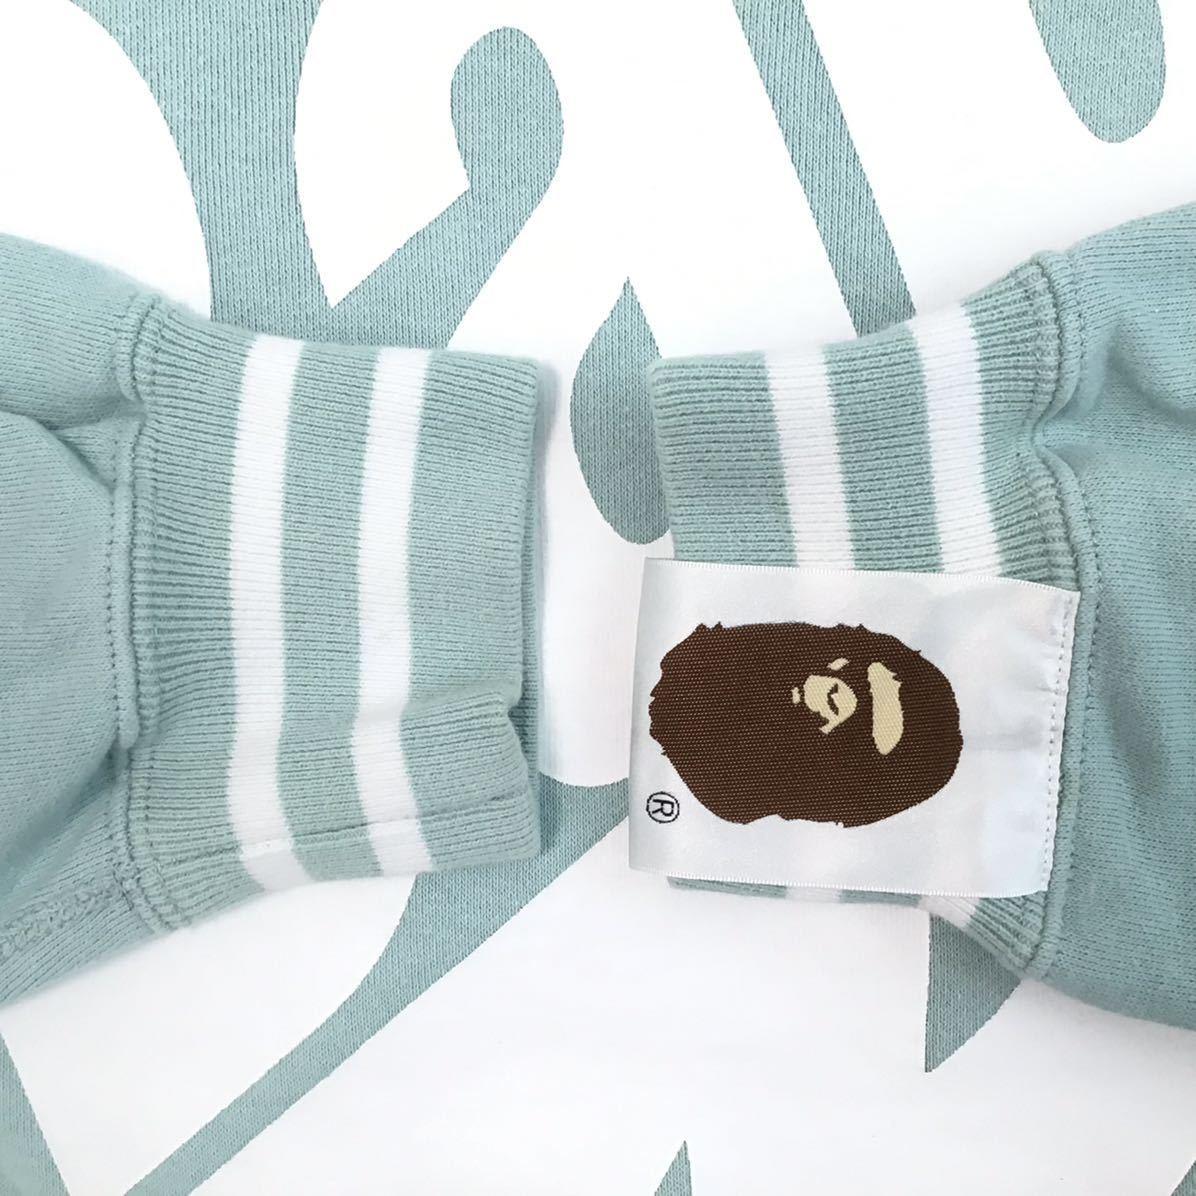 BAPE STA logo プルオーバー パーカー Lサイズ a bathing ape BAPE pullover hoodie エイプ ベイプ アベイシングエイプ star 968